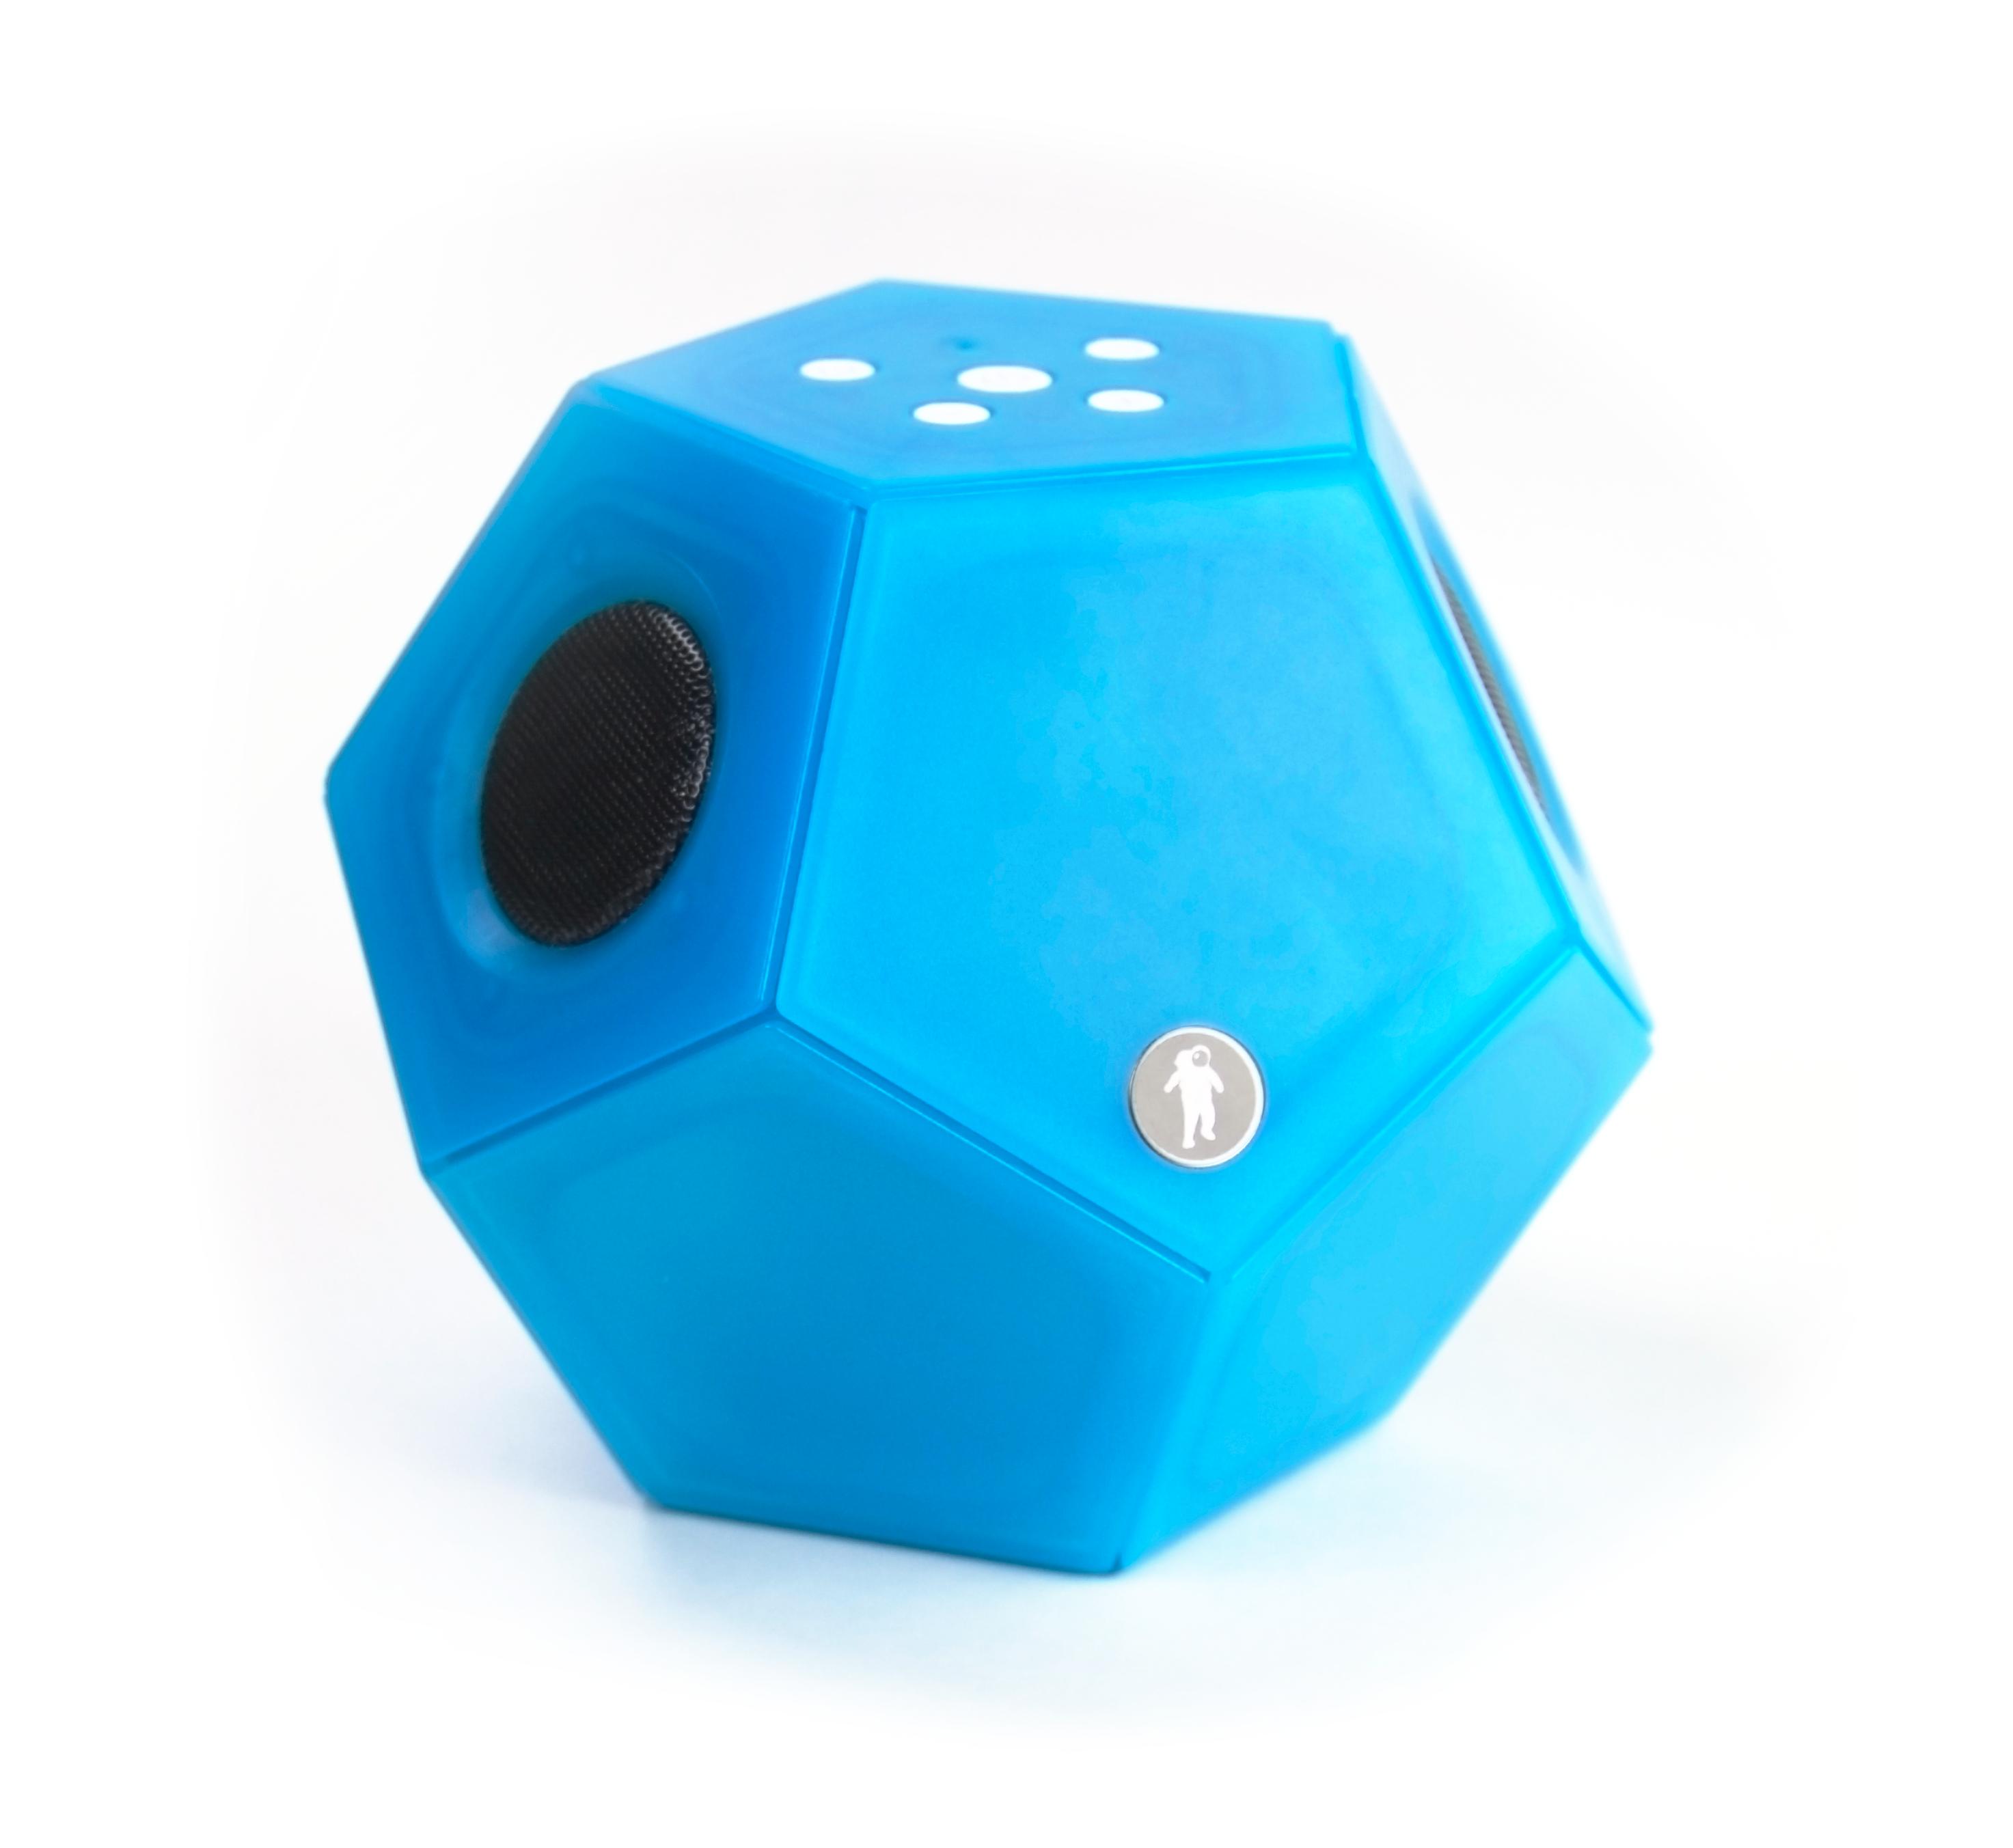 Audio Puzzle Build Your Own Bluetooth Speaker